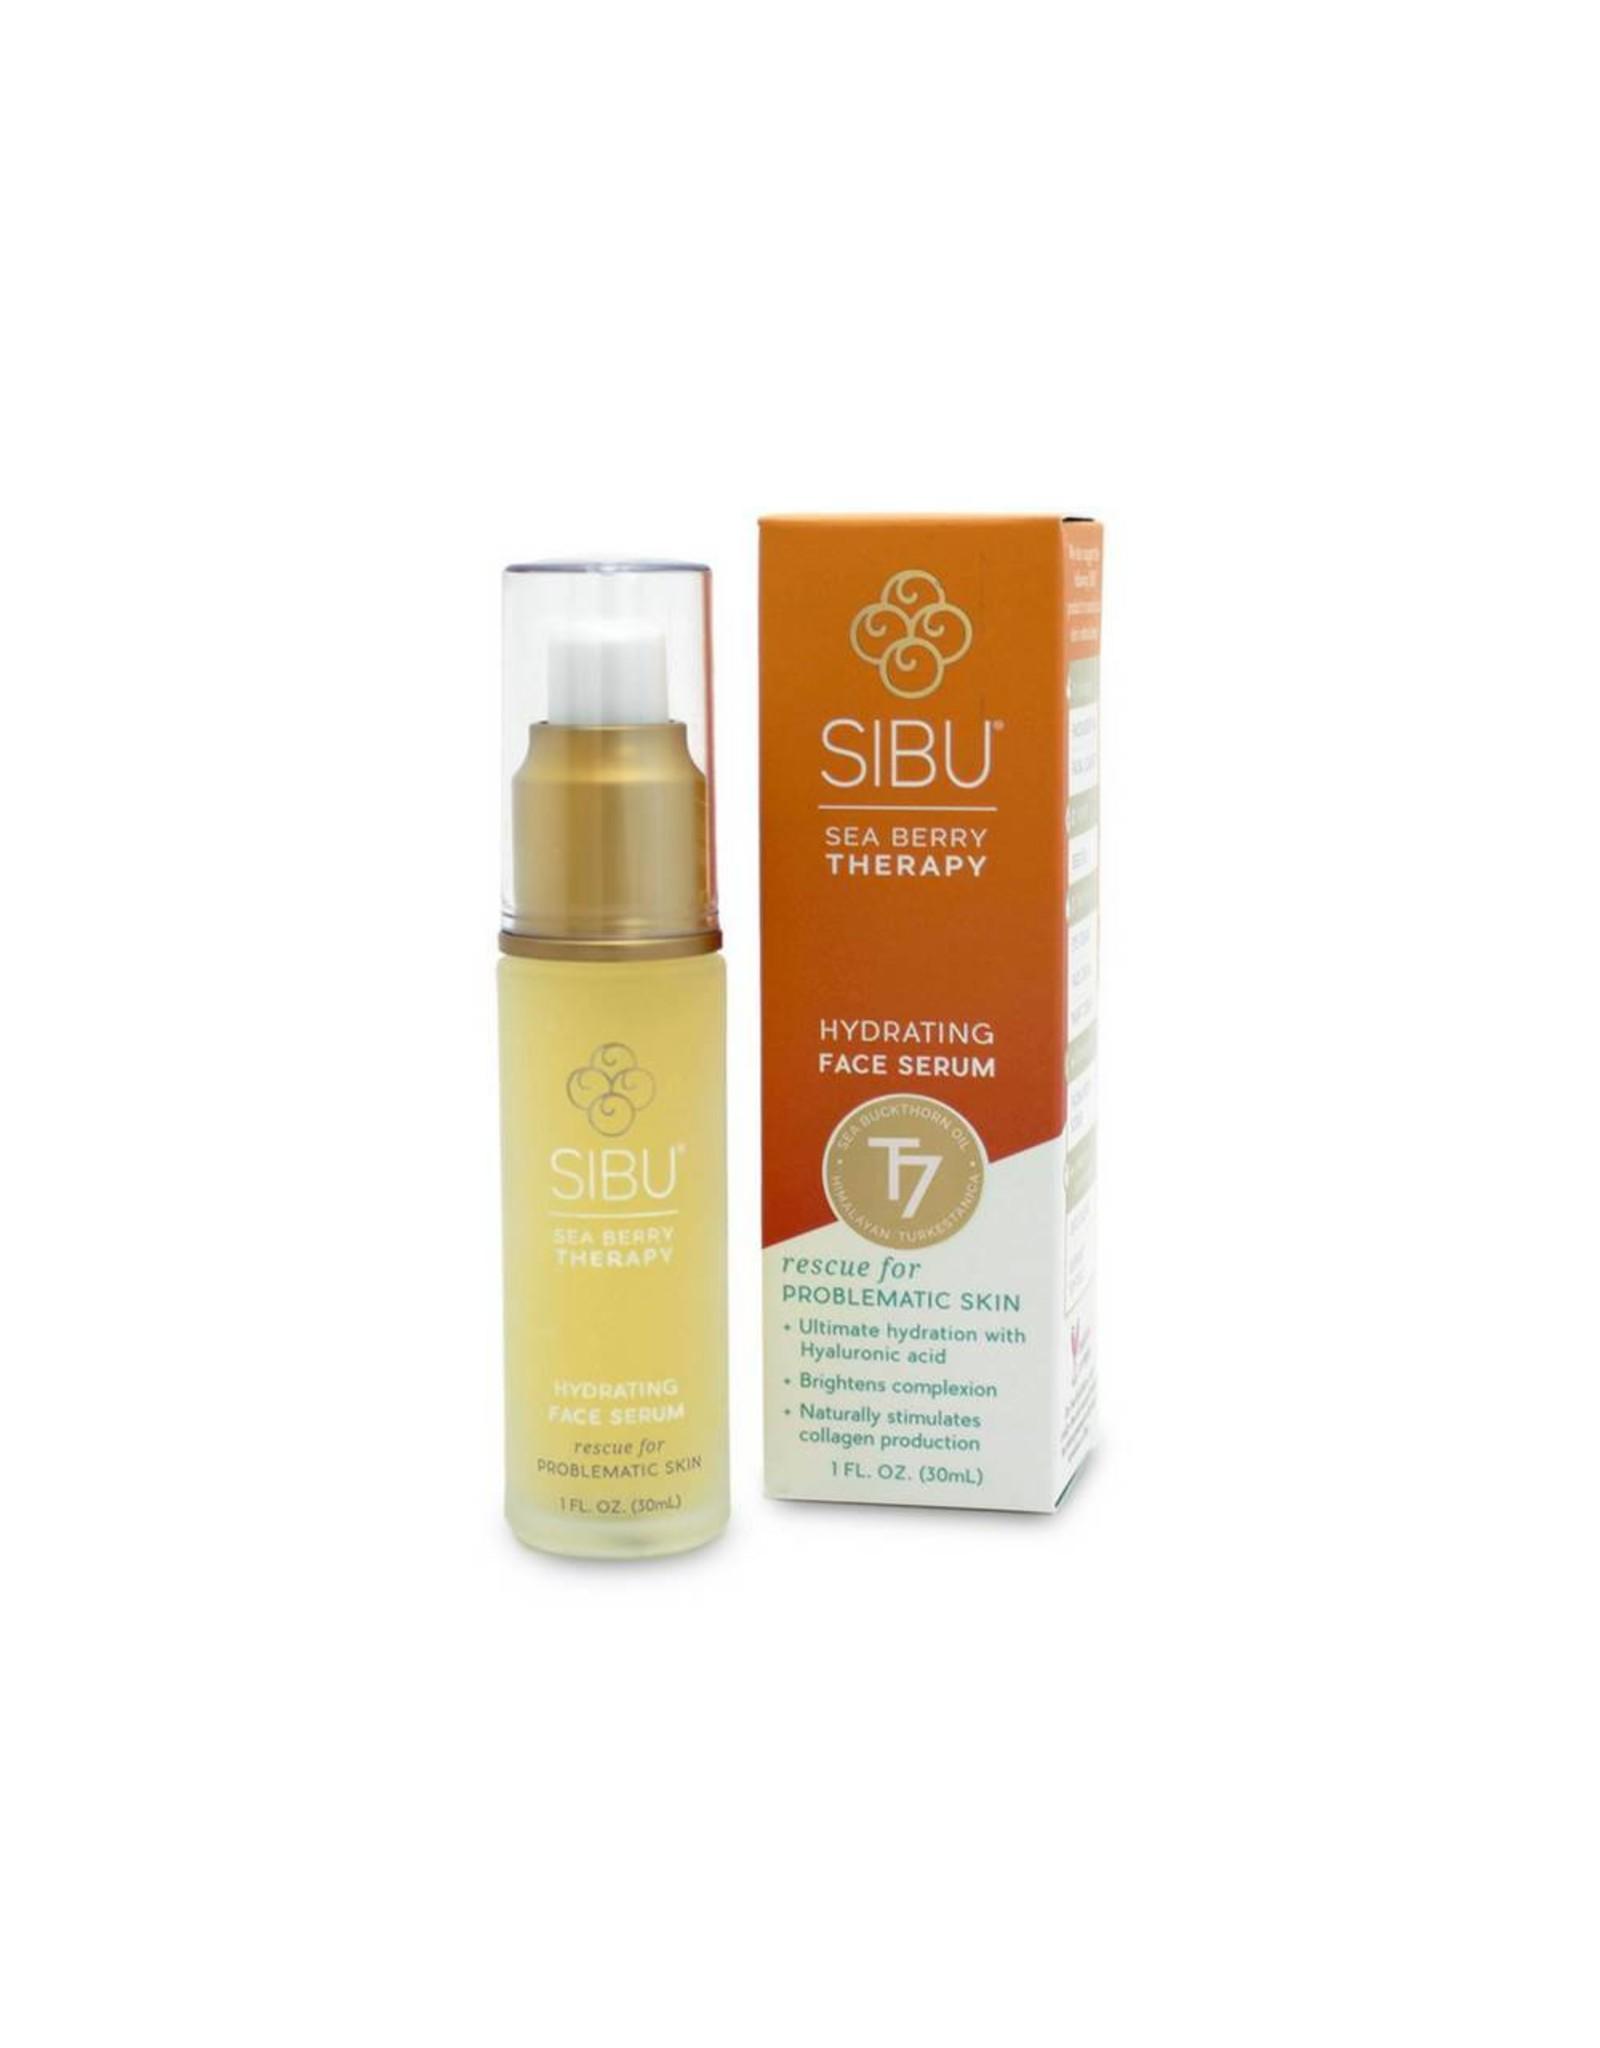 sibu™ Hydrating Serum - Sea Buckthorn Seed